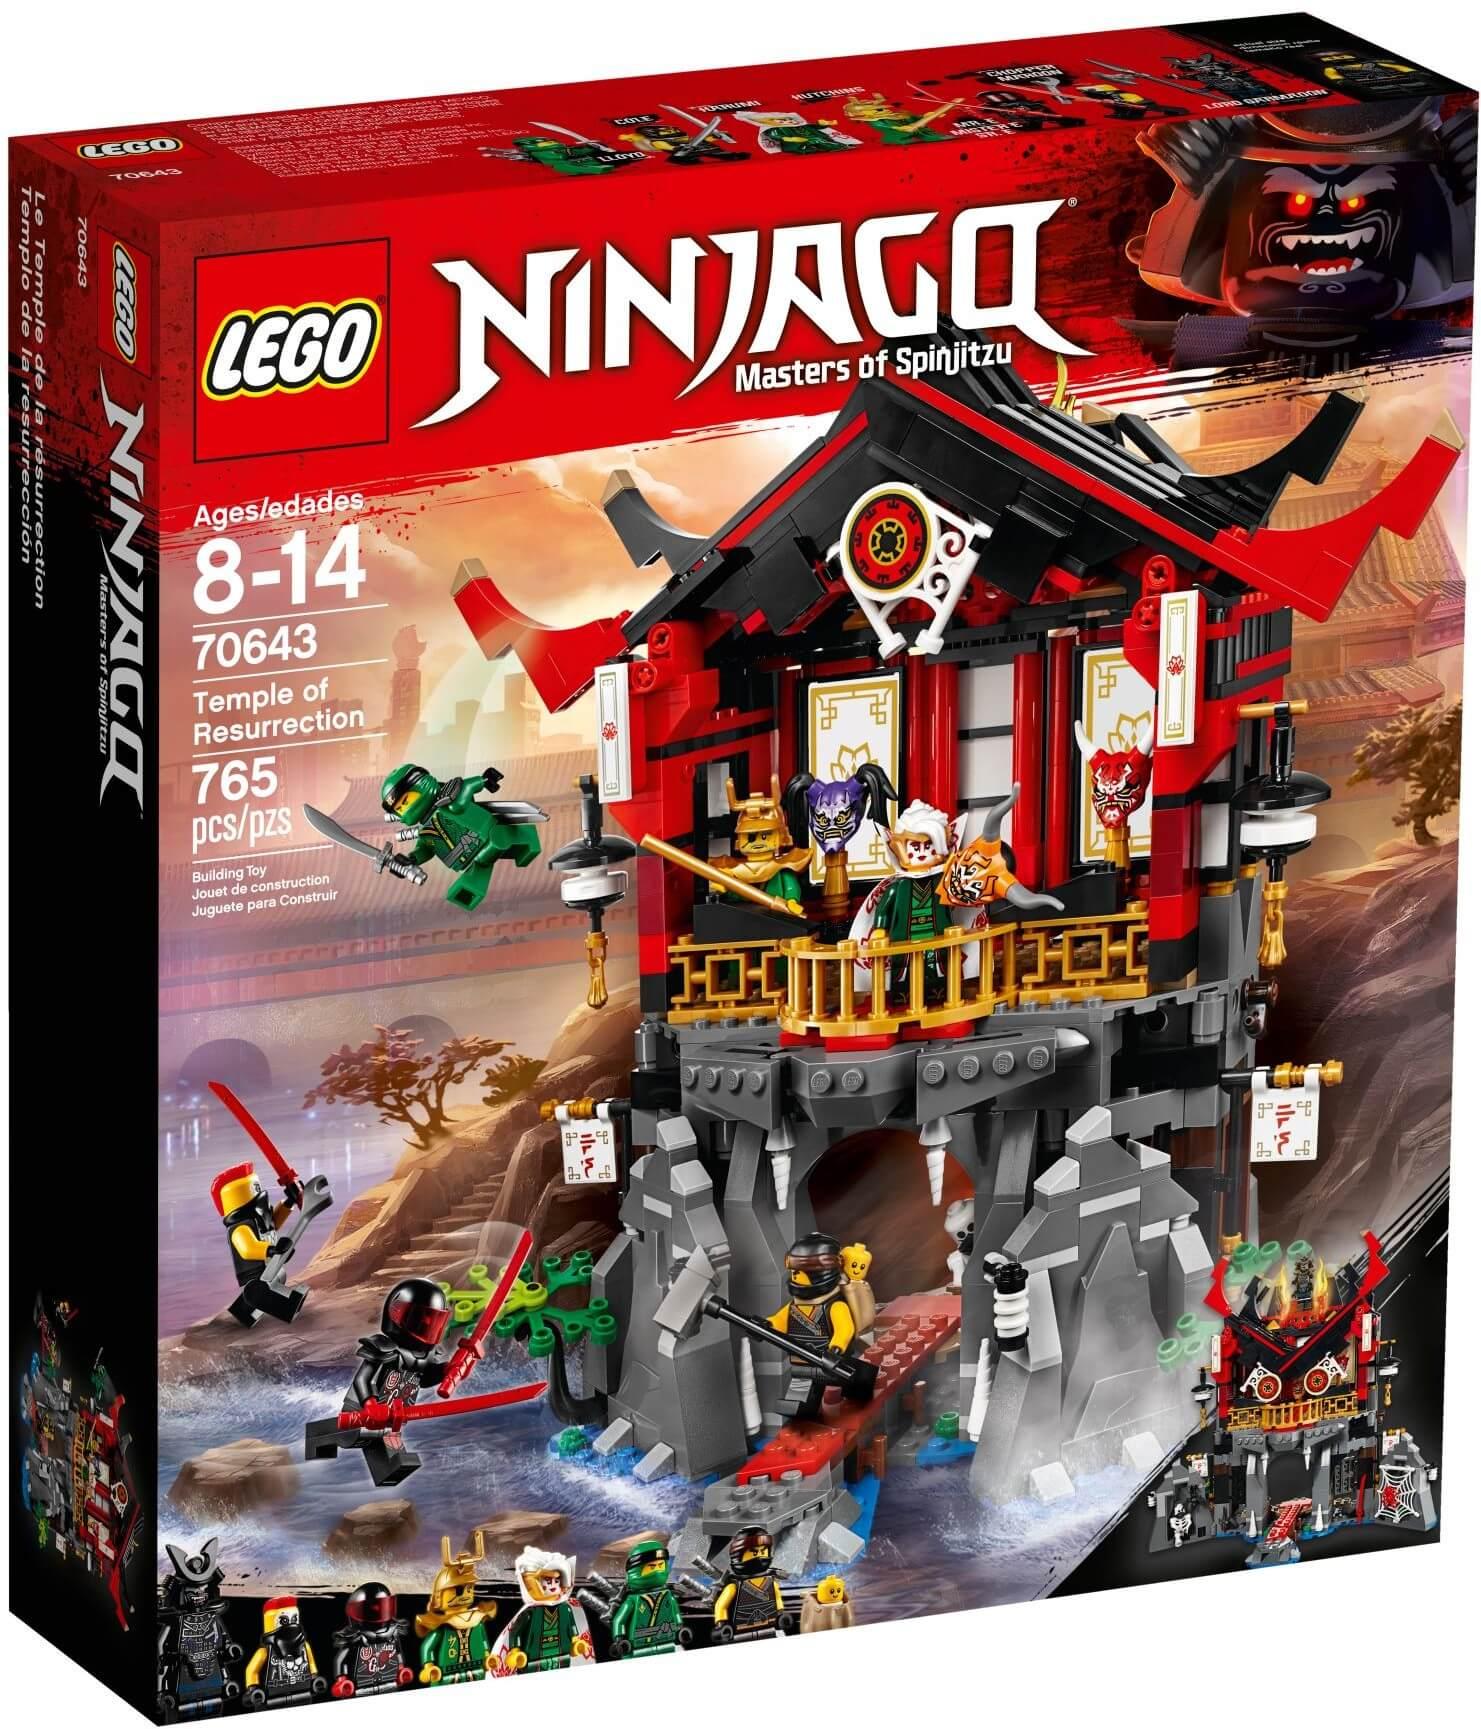 Mua đồ chơi LEGO 70643 - LEGO Ninjago 70643 - Ngôi Đền Hồi Sinh (LEGO Ninjago 70643 Temple of Resurrection)